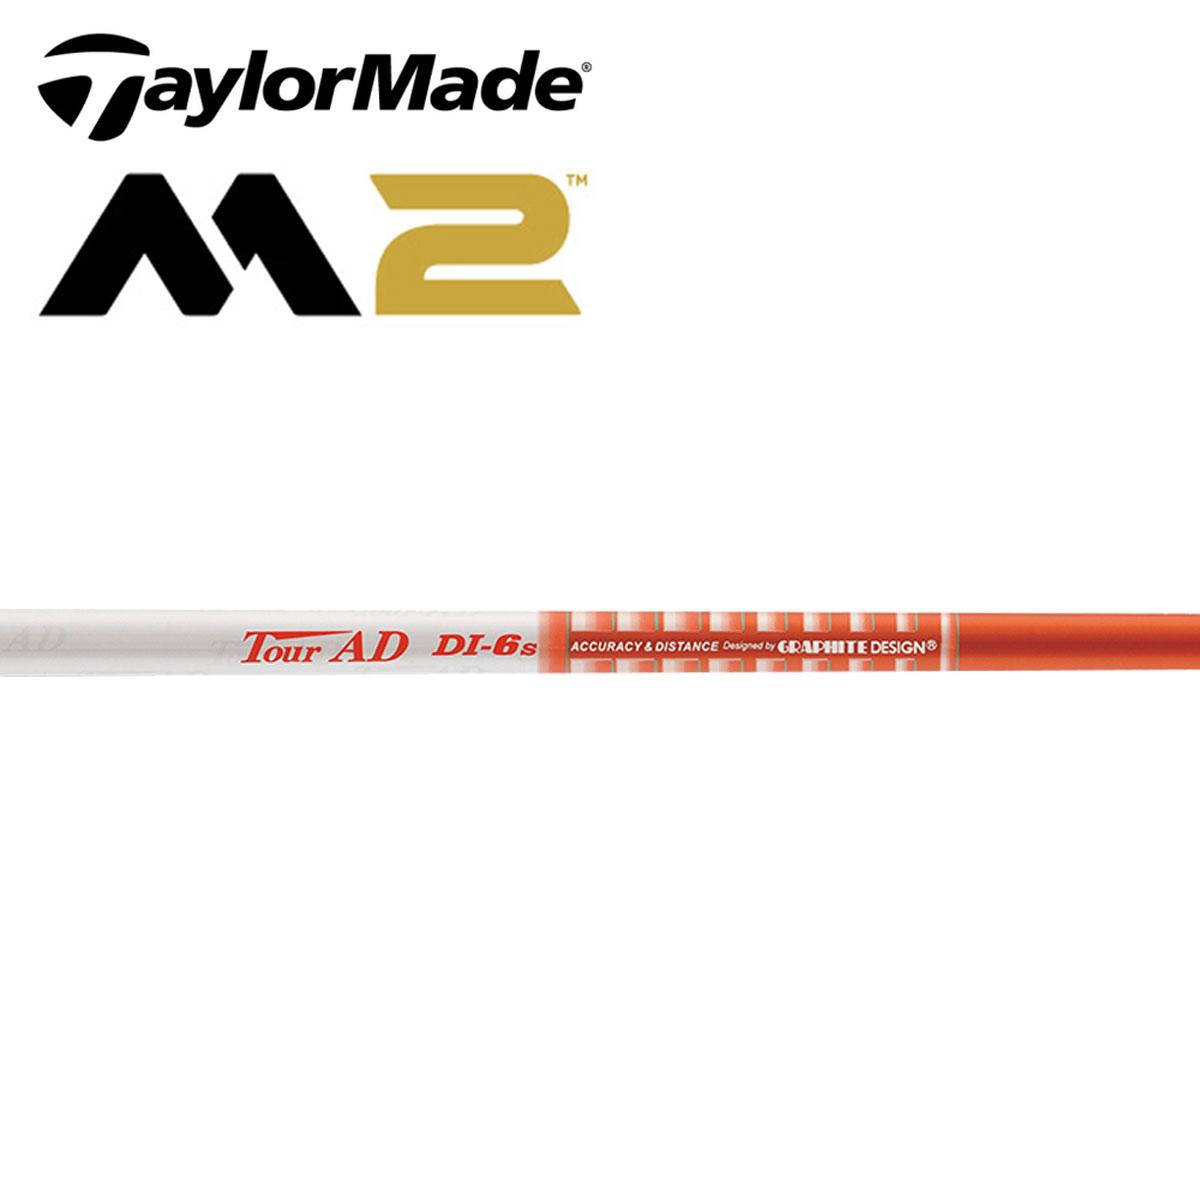 Tour AD DIシリーズ M2 ドライバーロフト9.5度用スリーブ付きシャフト 2016年モデル【テーラーメイド専用】